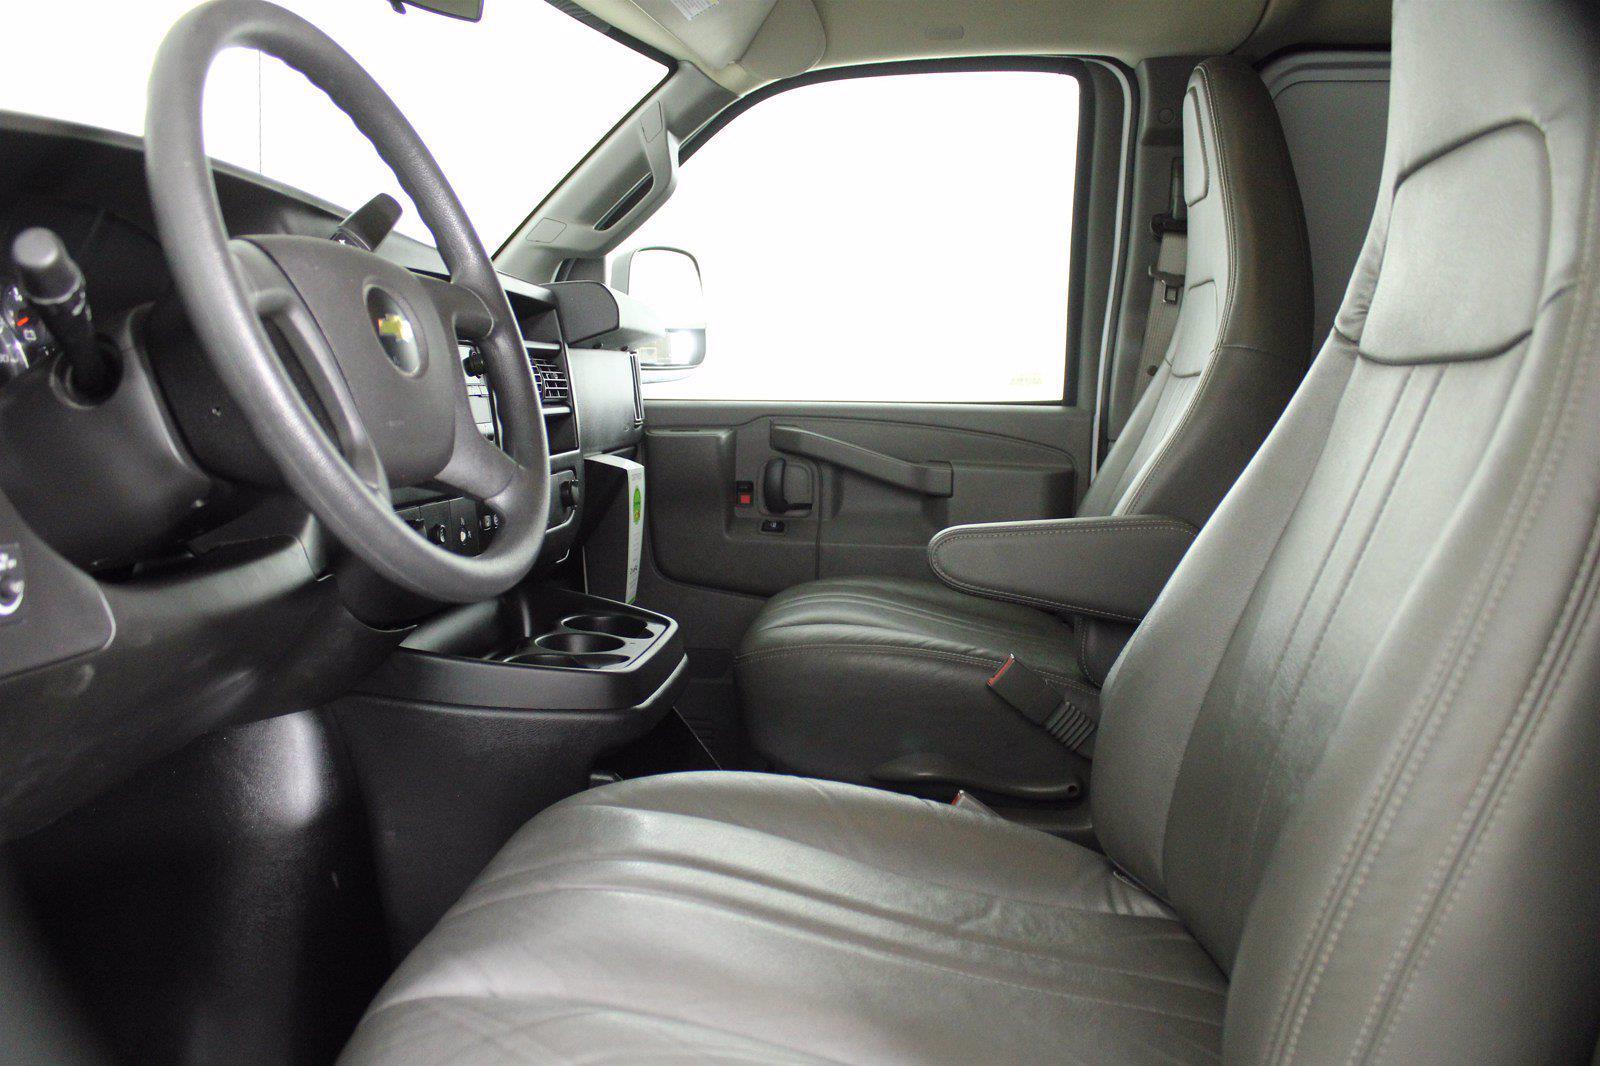 2017 Chevrolet Express 2500 4x2, Empty Cargo Van #DAC0339 - photo 6